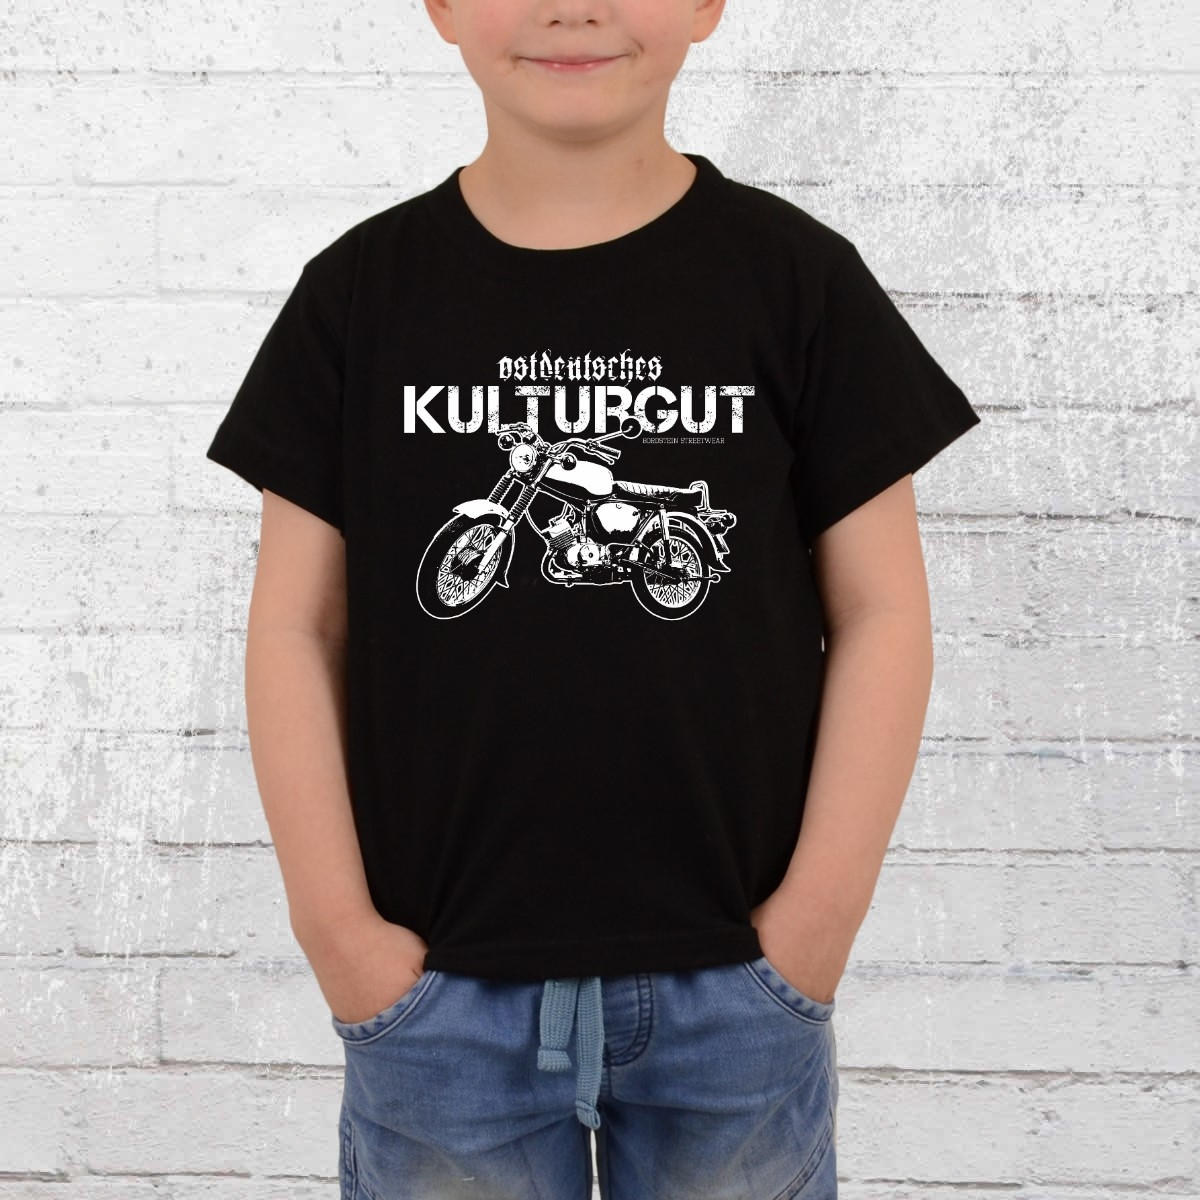 Bordstein Kinder T-Shirt Ostdeutsches Kulturgut schwarz